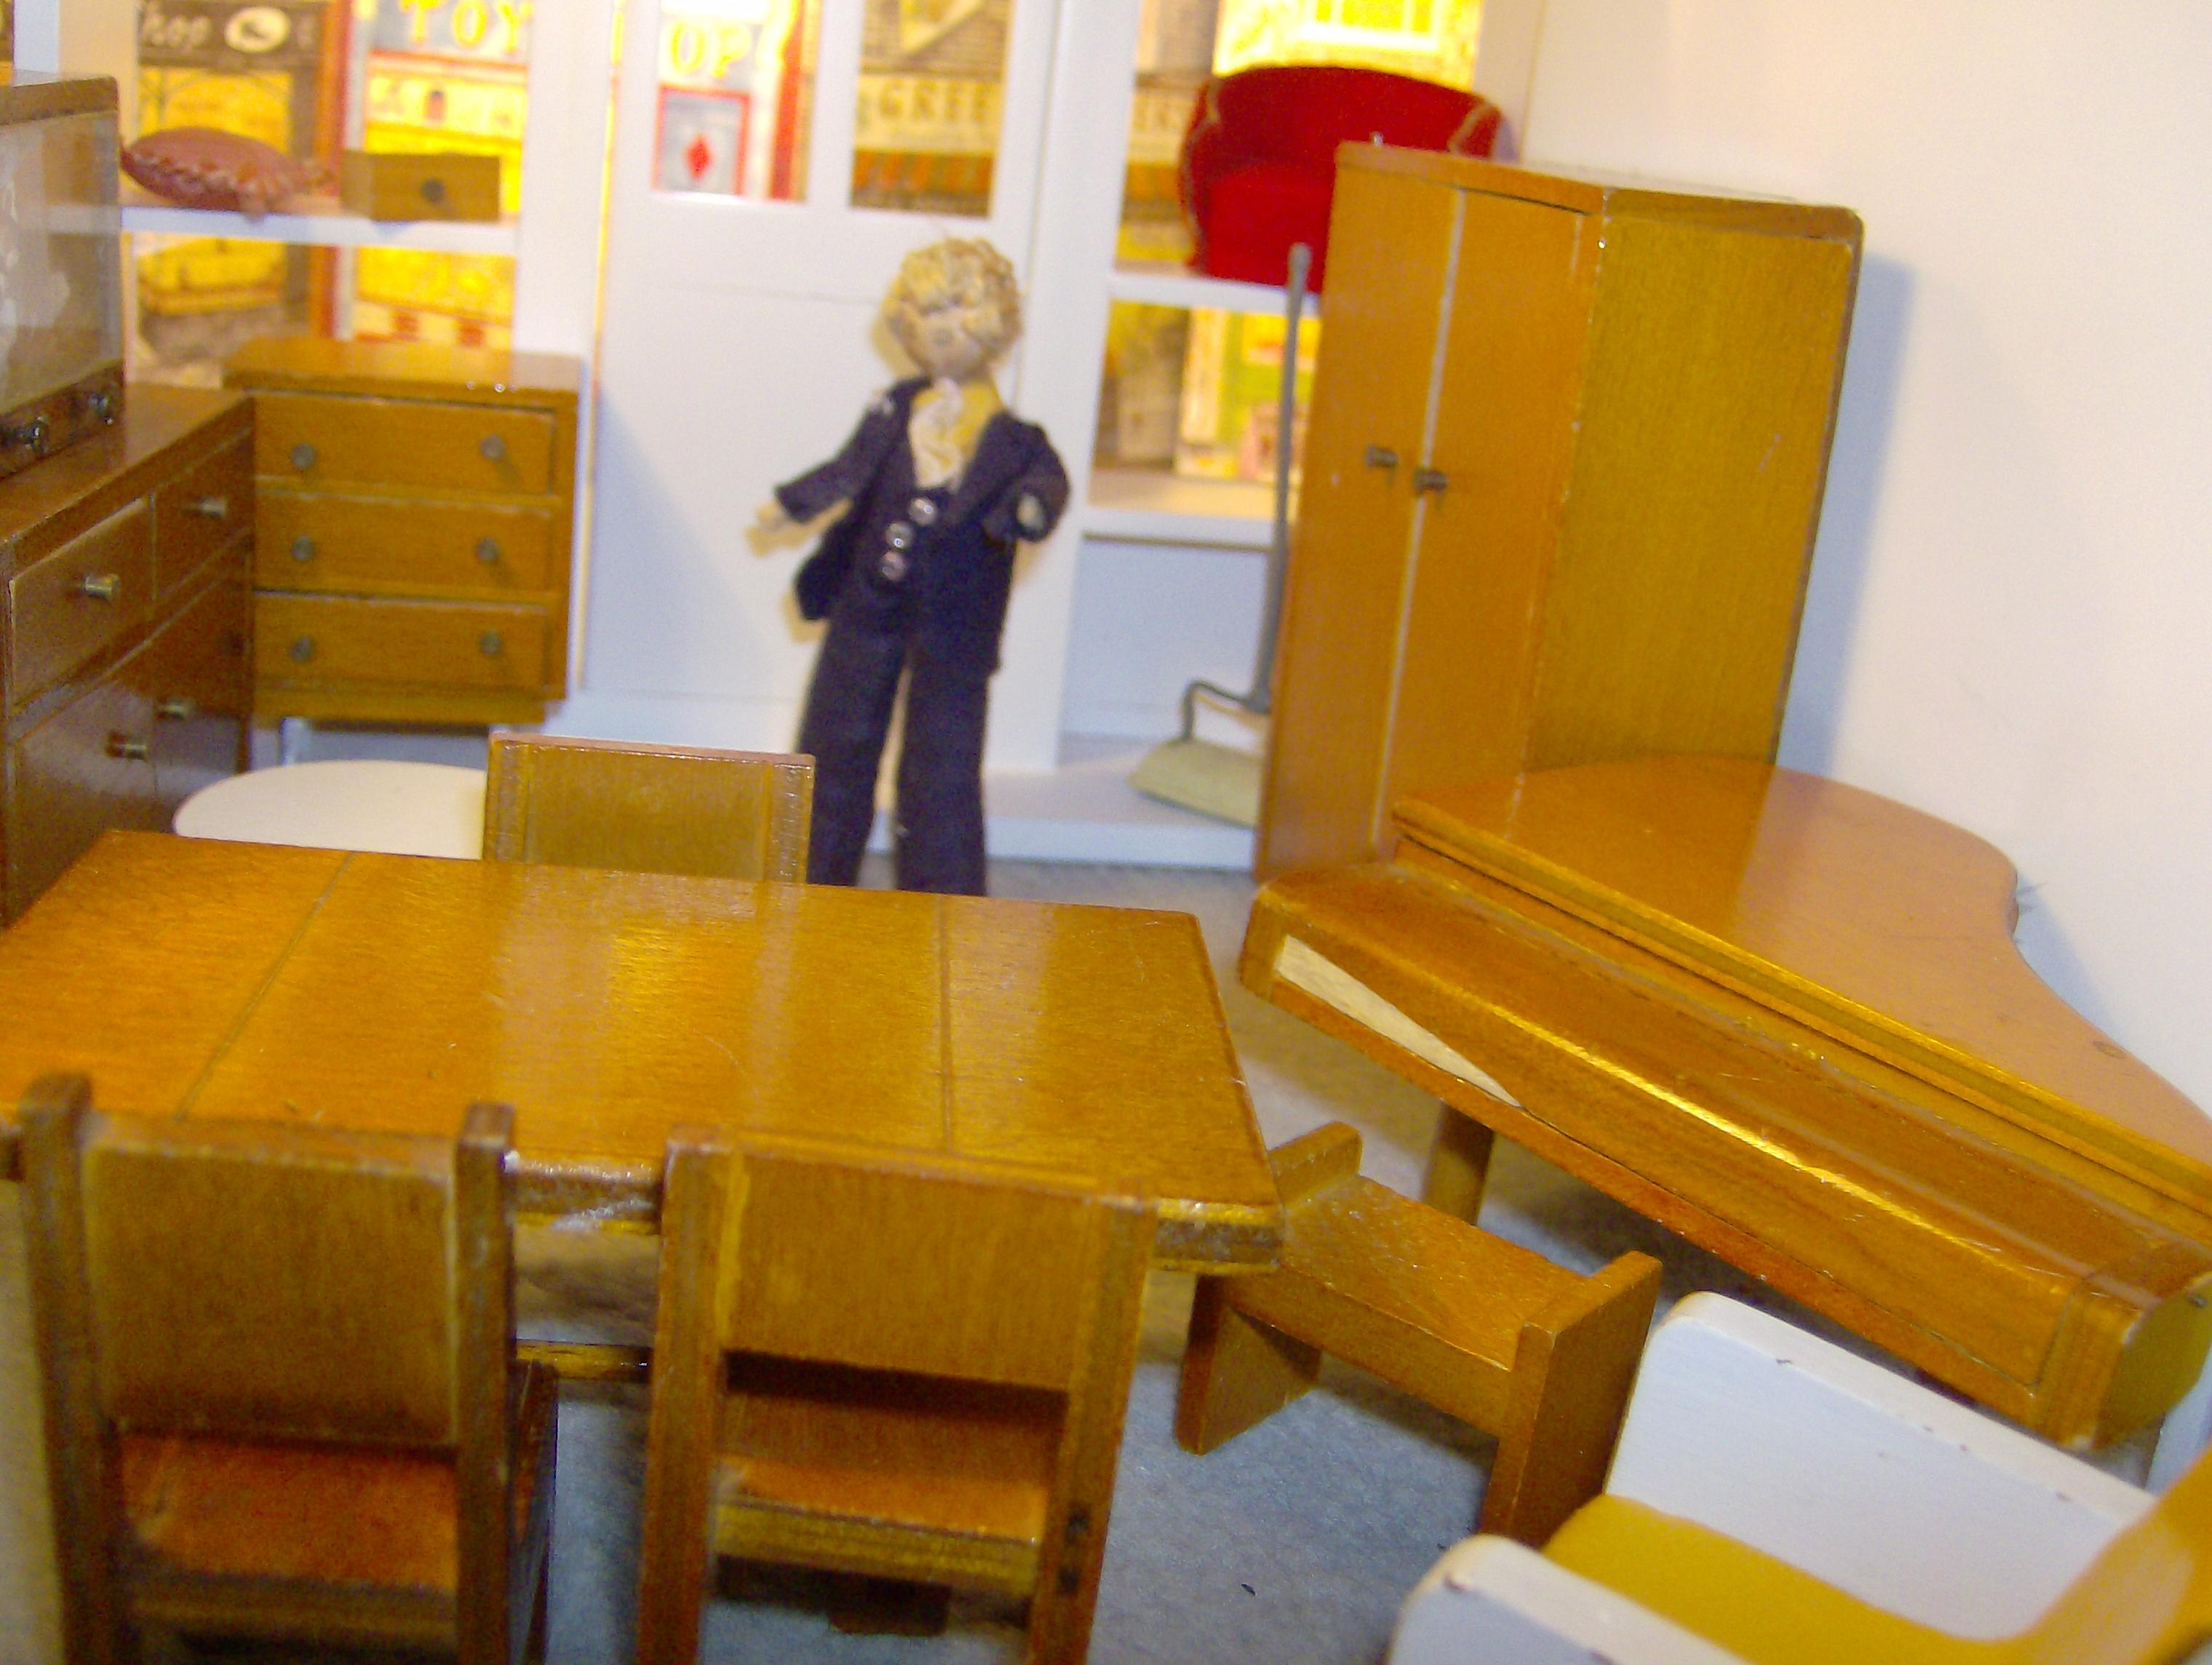 Cedric Valley ruefully surveyed his new premises.